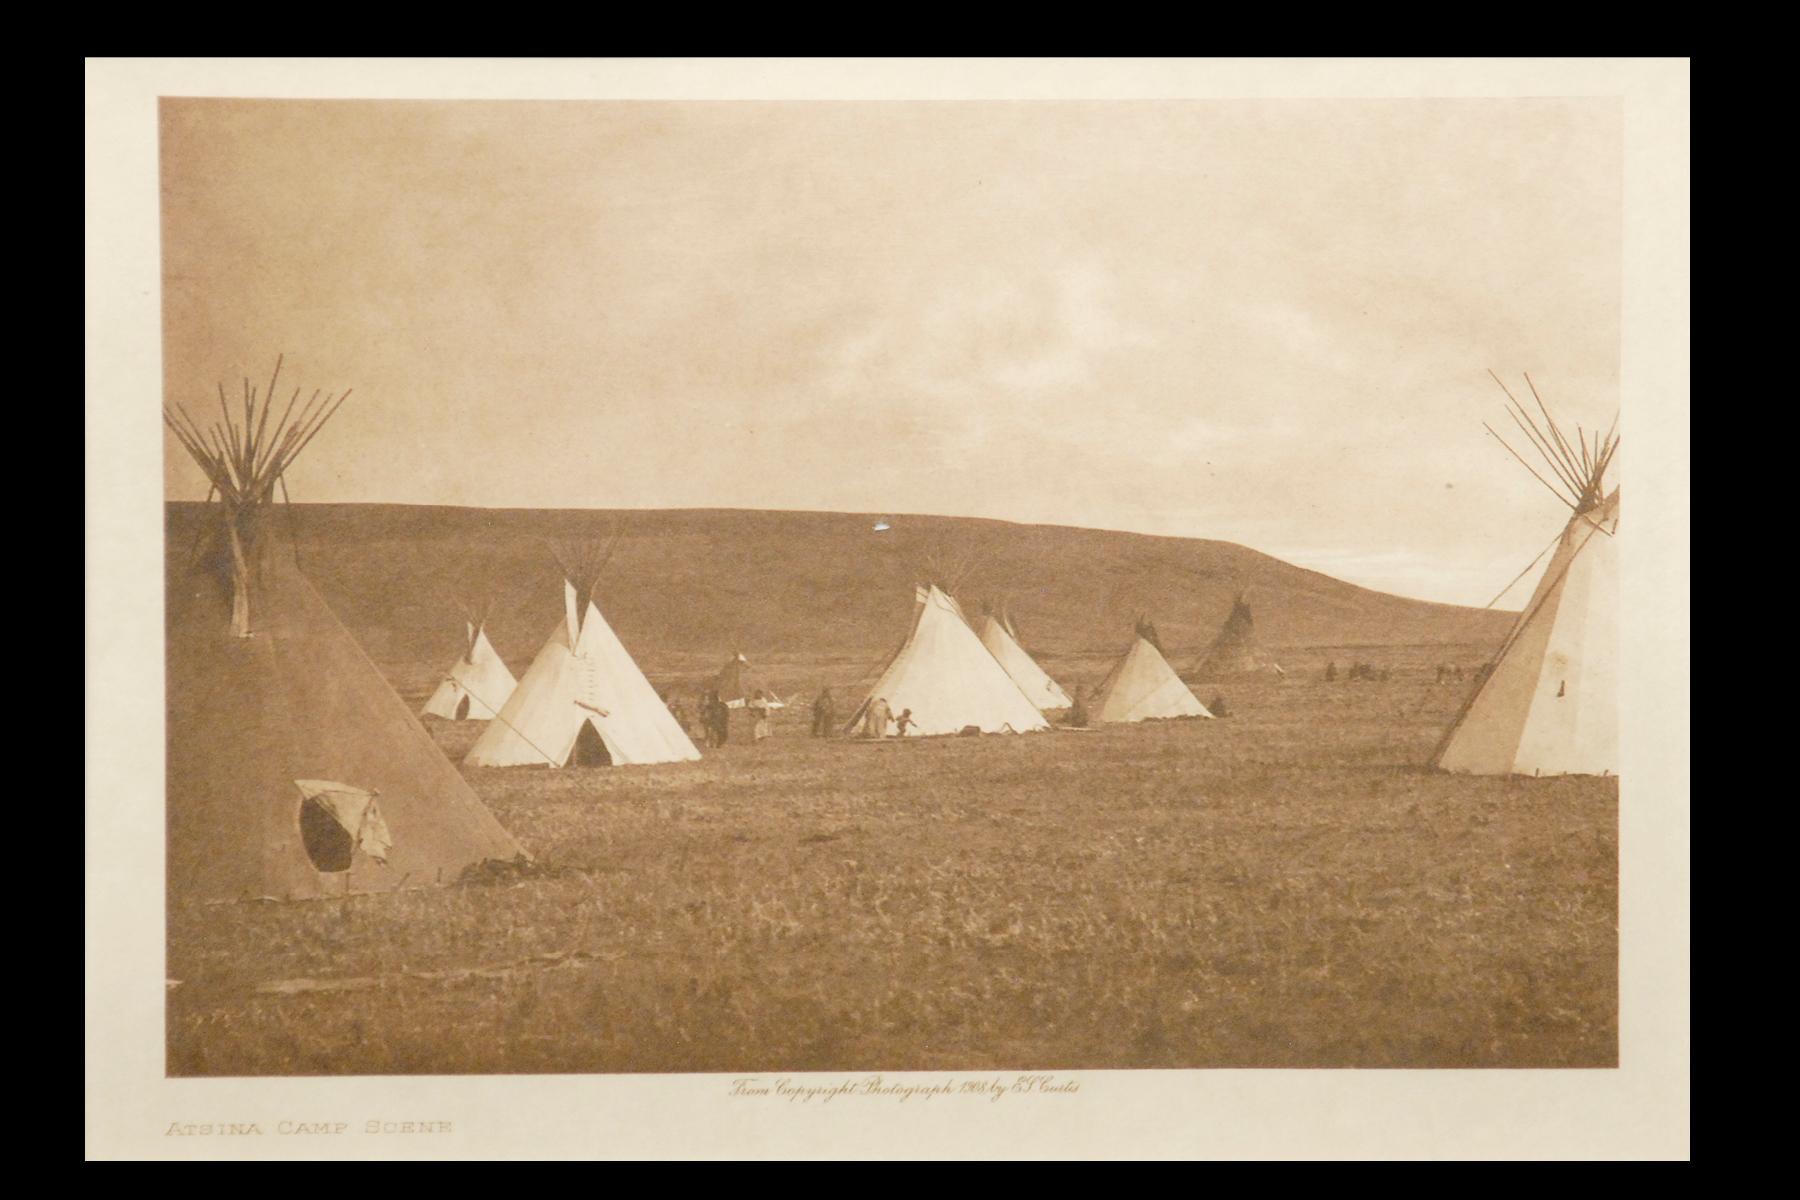 """Atsina Camp Scene"" Vol.5 1908 Vellum Print, Vintage Photogravure"